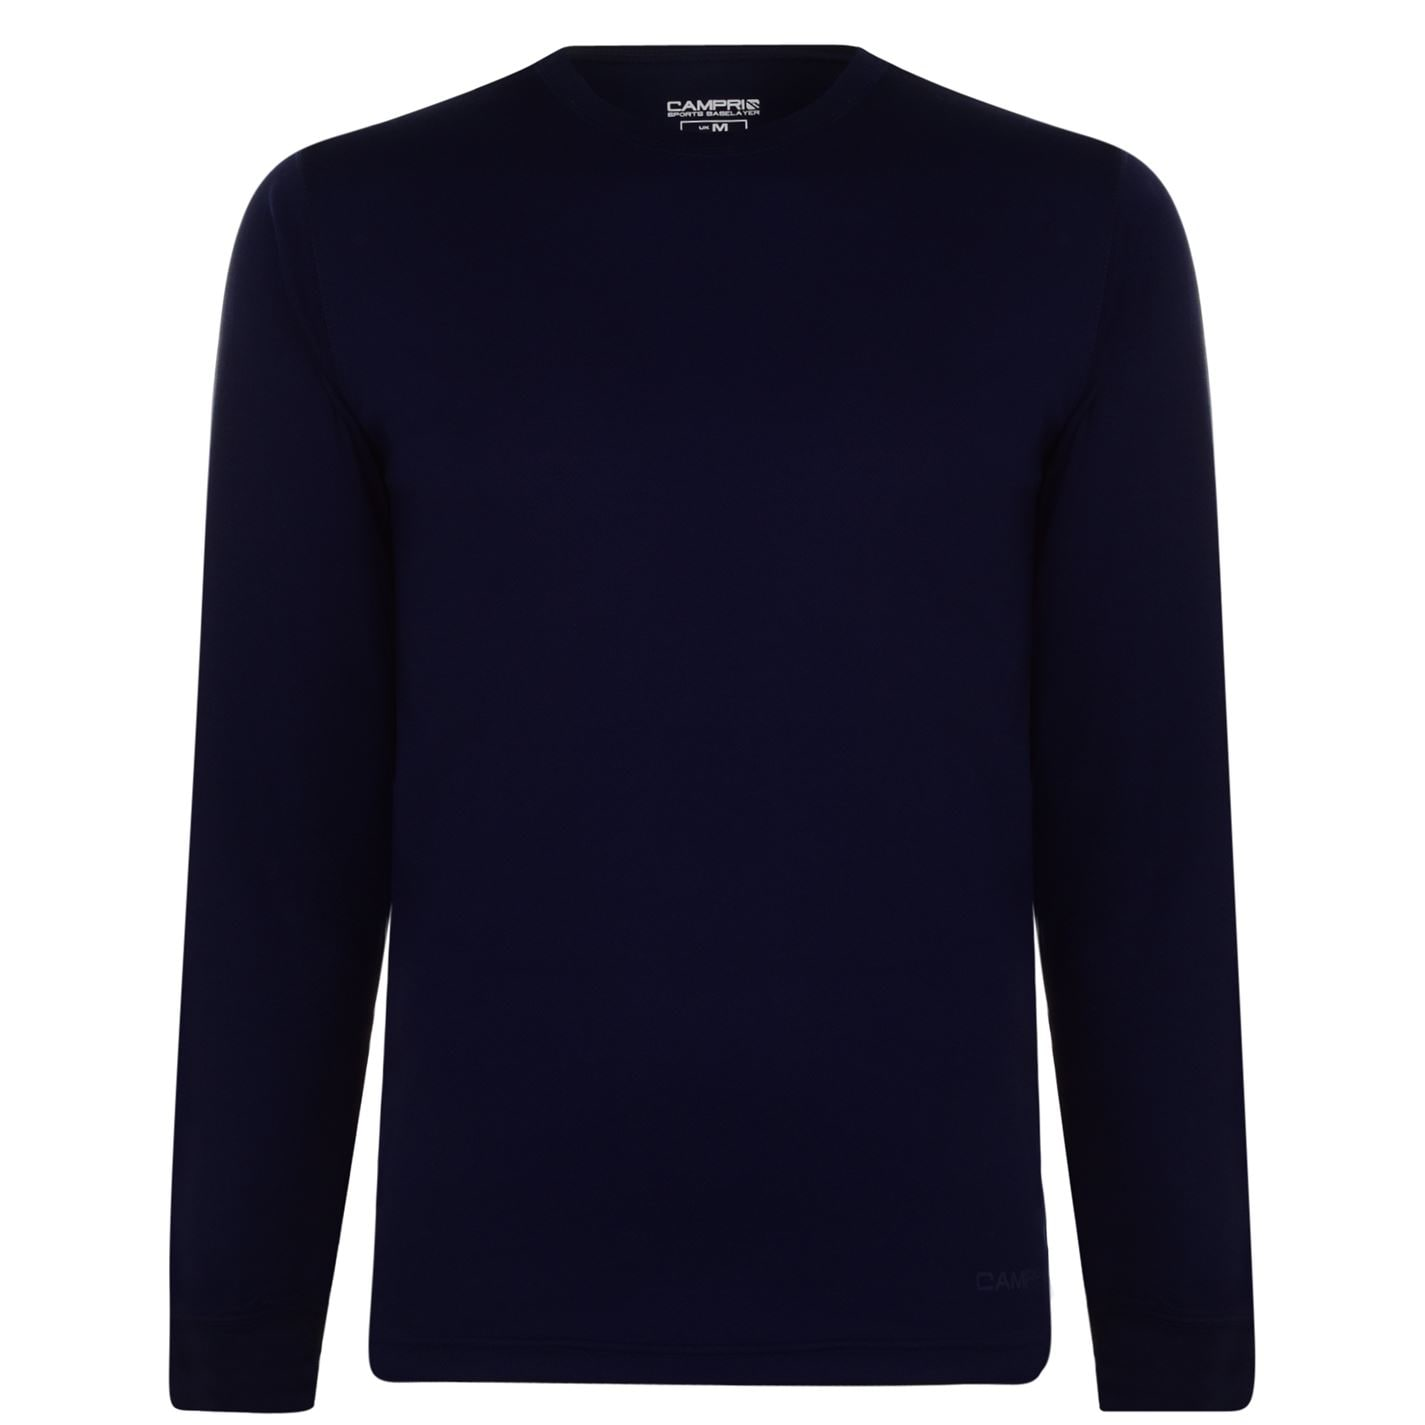 Mergi la Bluza de corp Campri termic pentru Barbati bleumarin